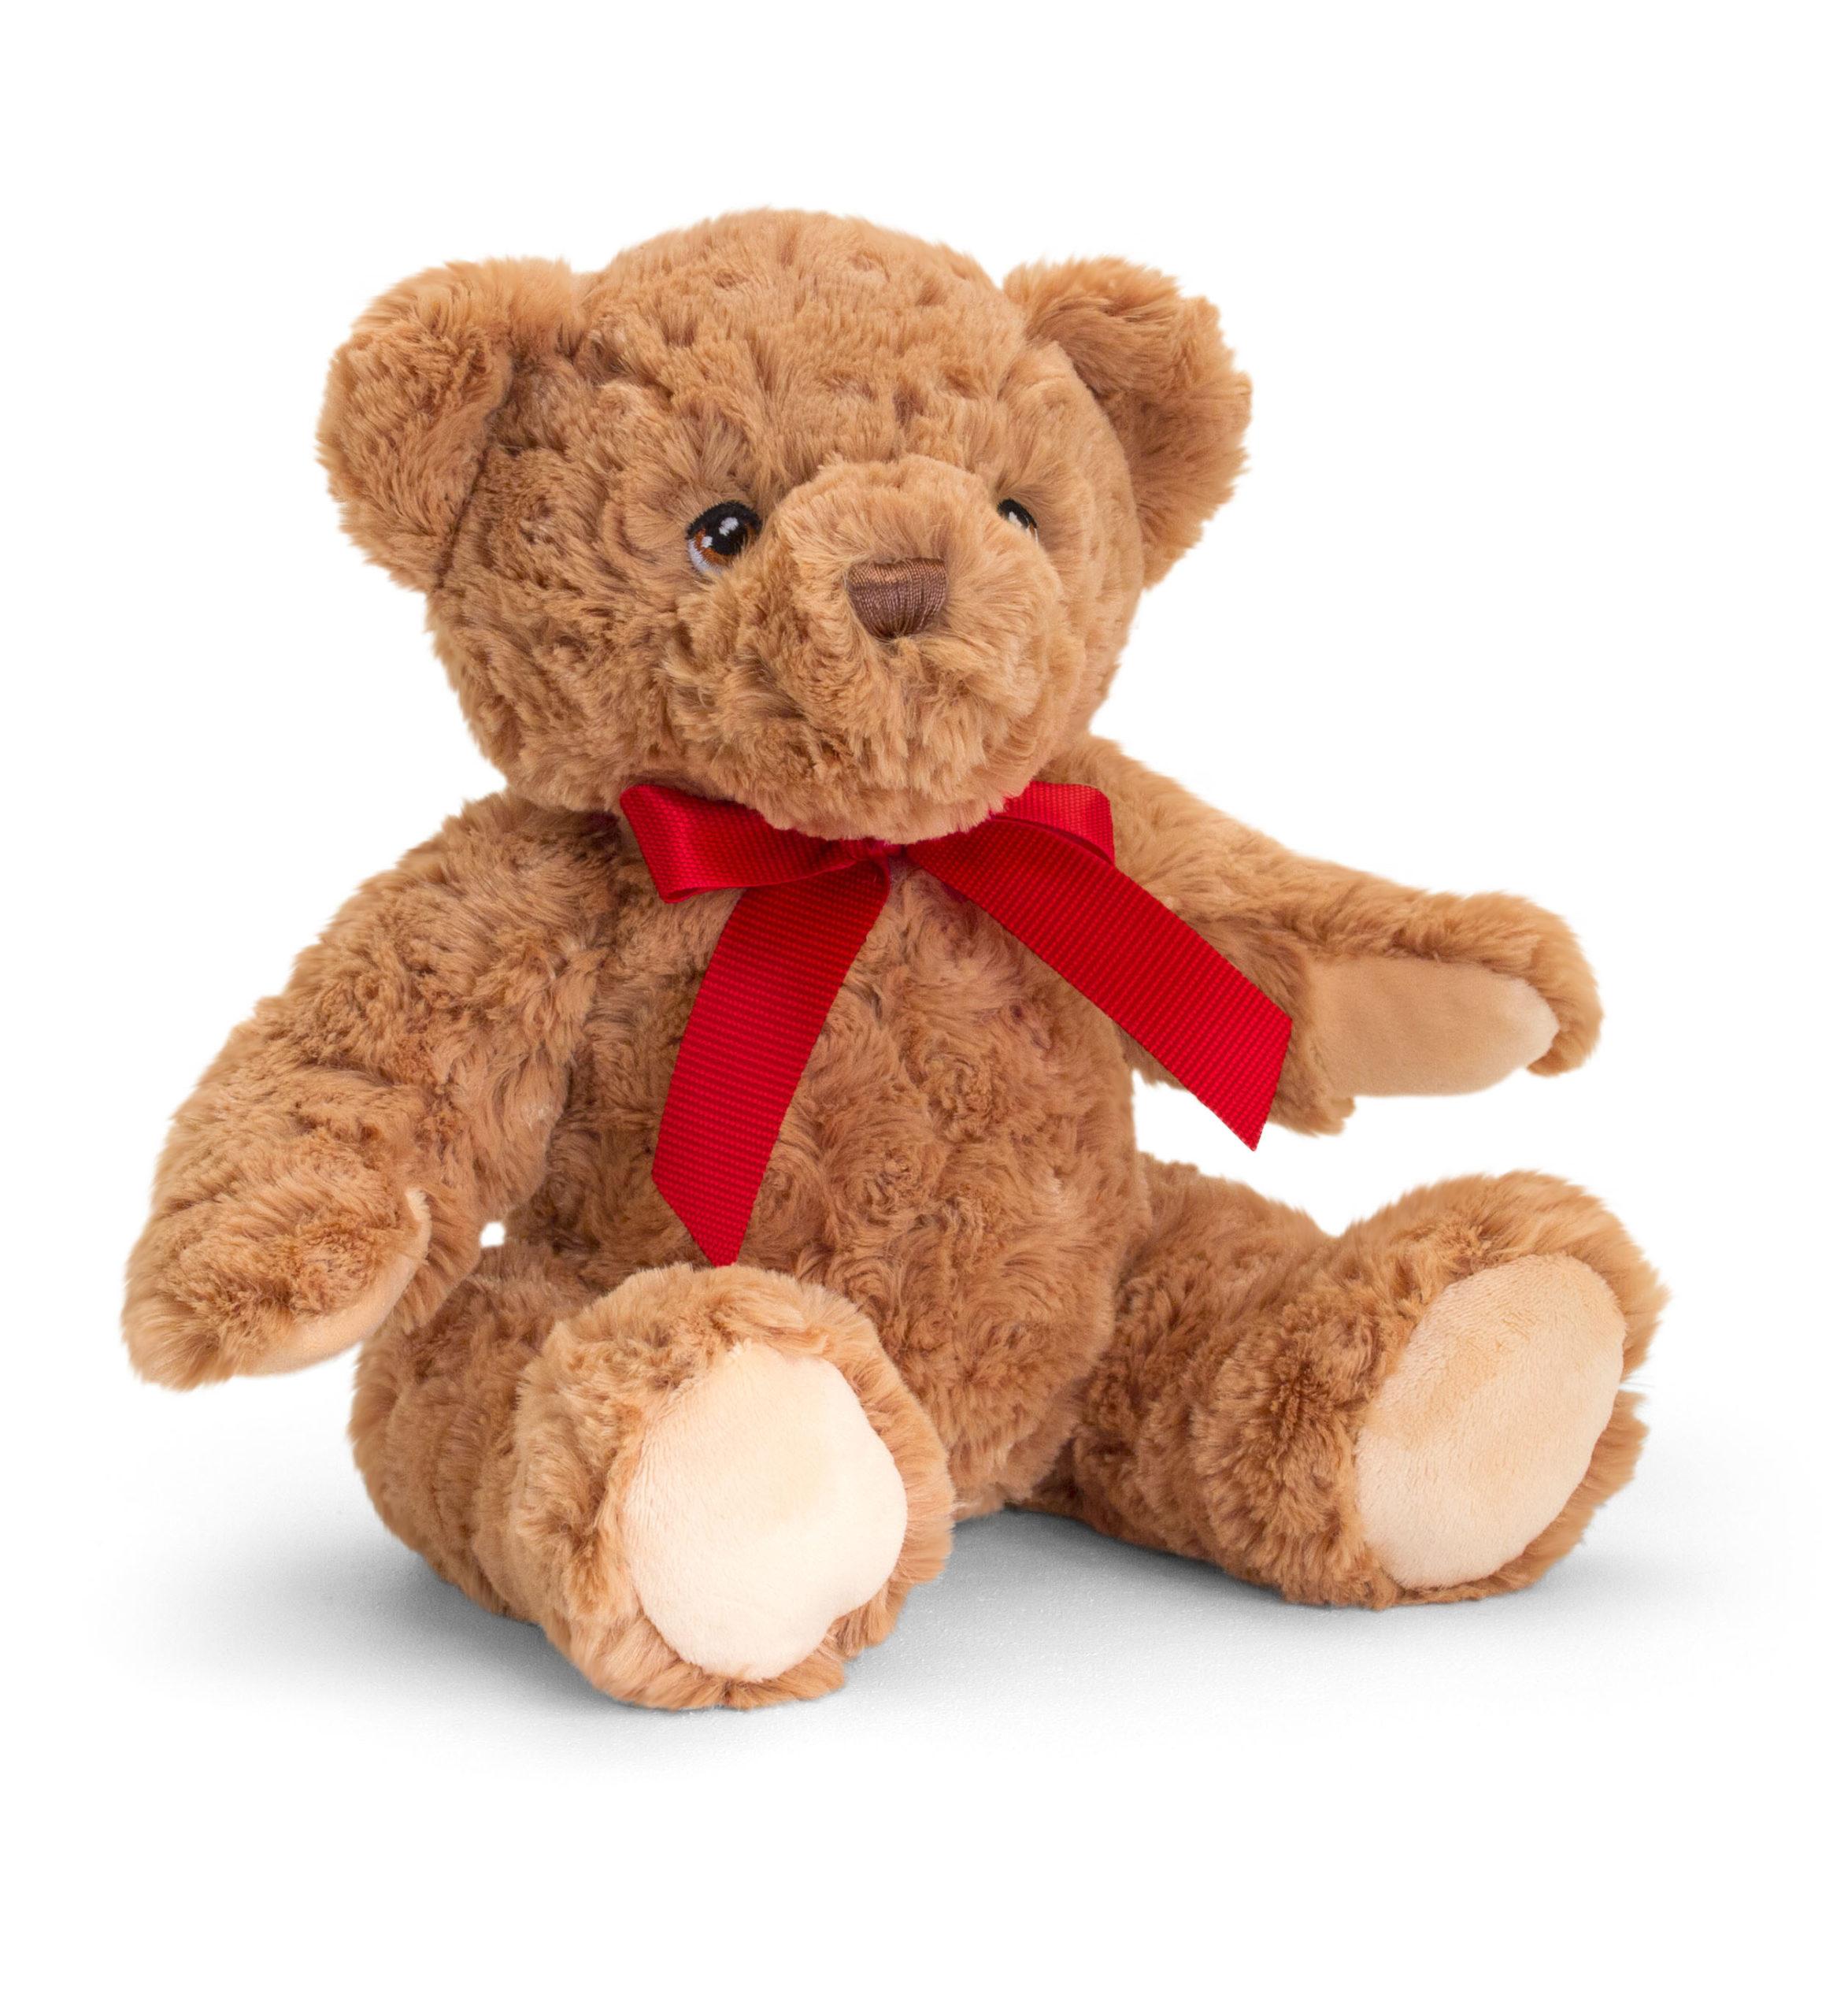 25cm Keeleco Teddy